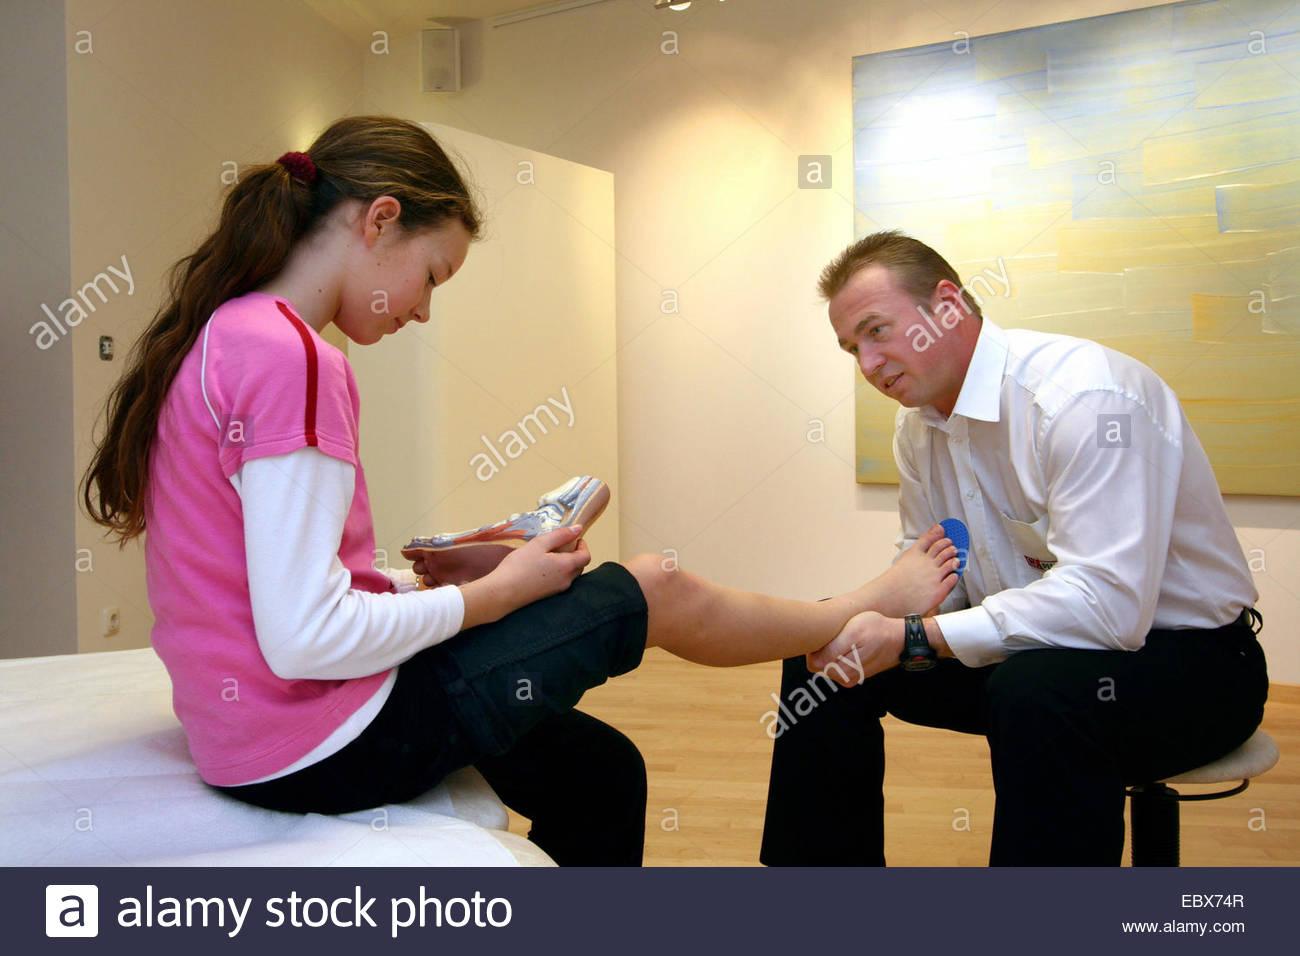 orthopedist adapting the shoe inserts - Stock Image